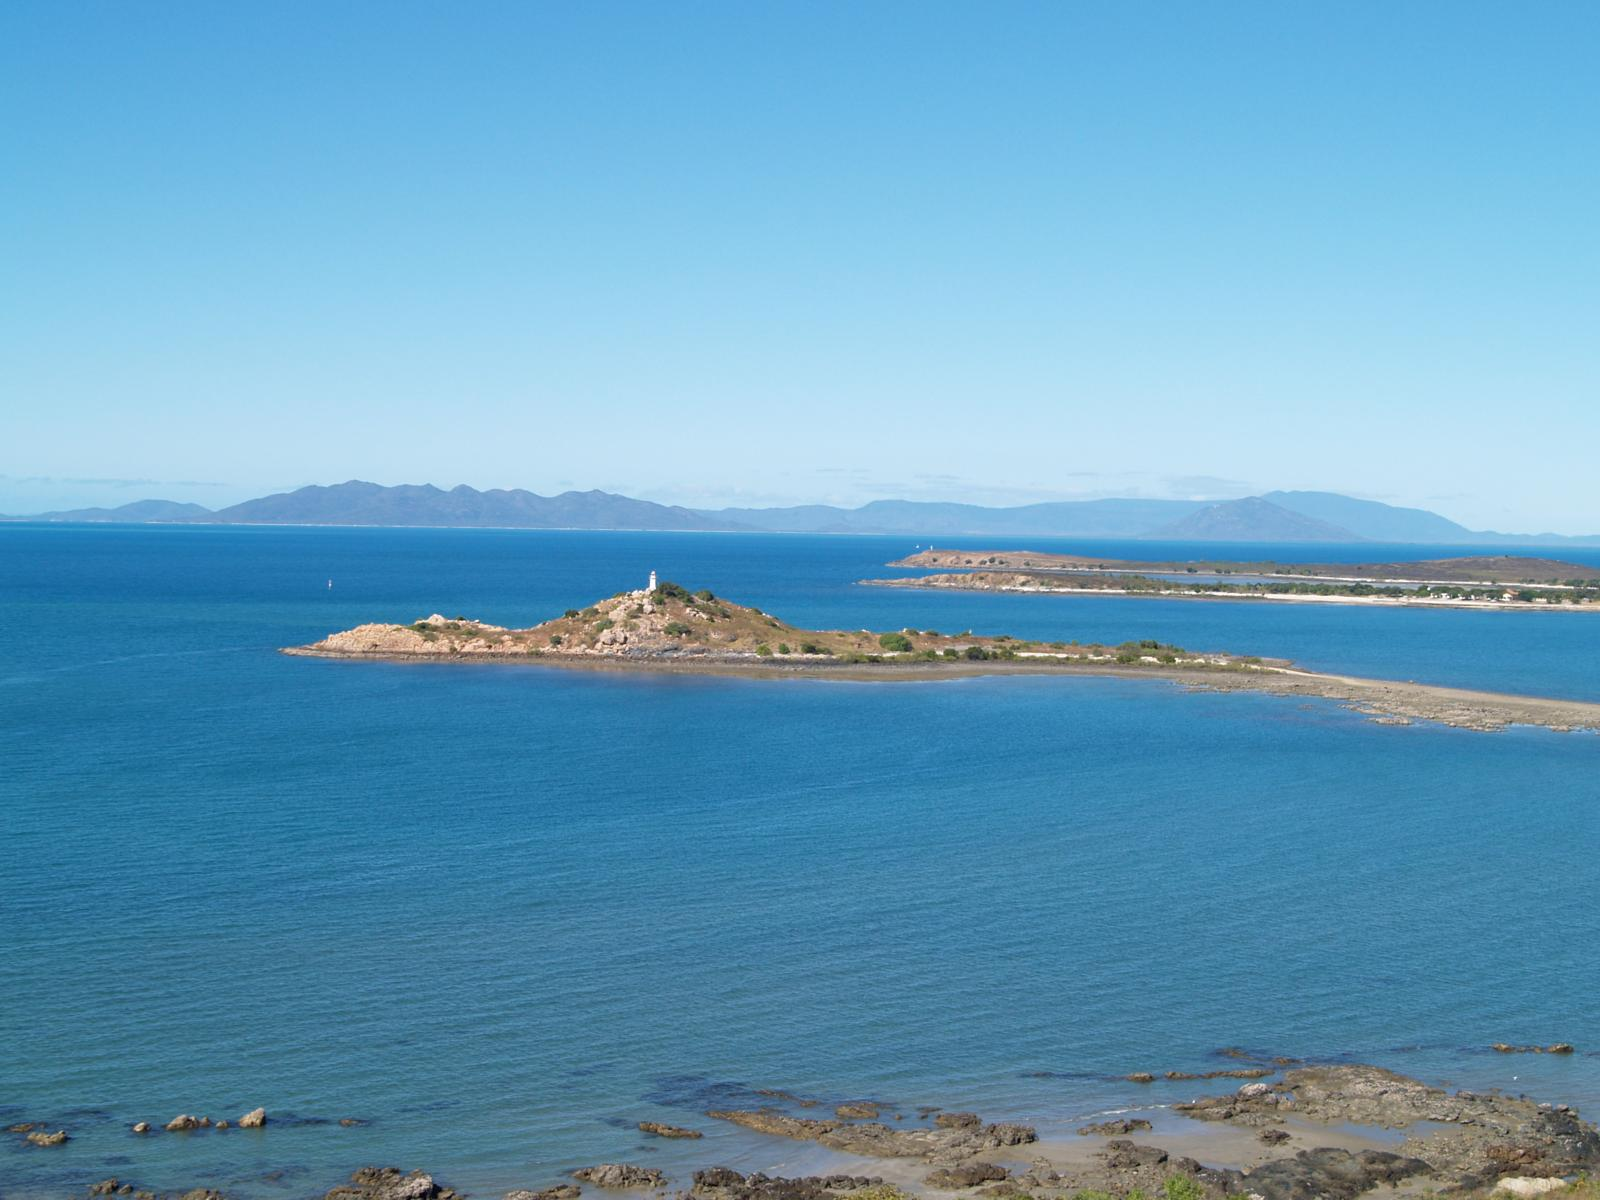 View across Bowen Heads to Whitsunday Island